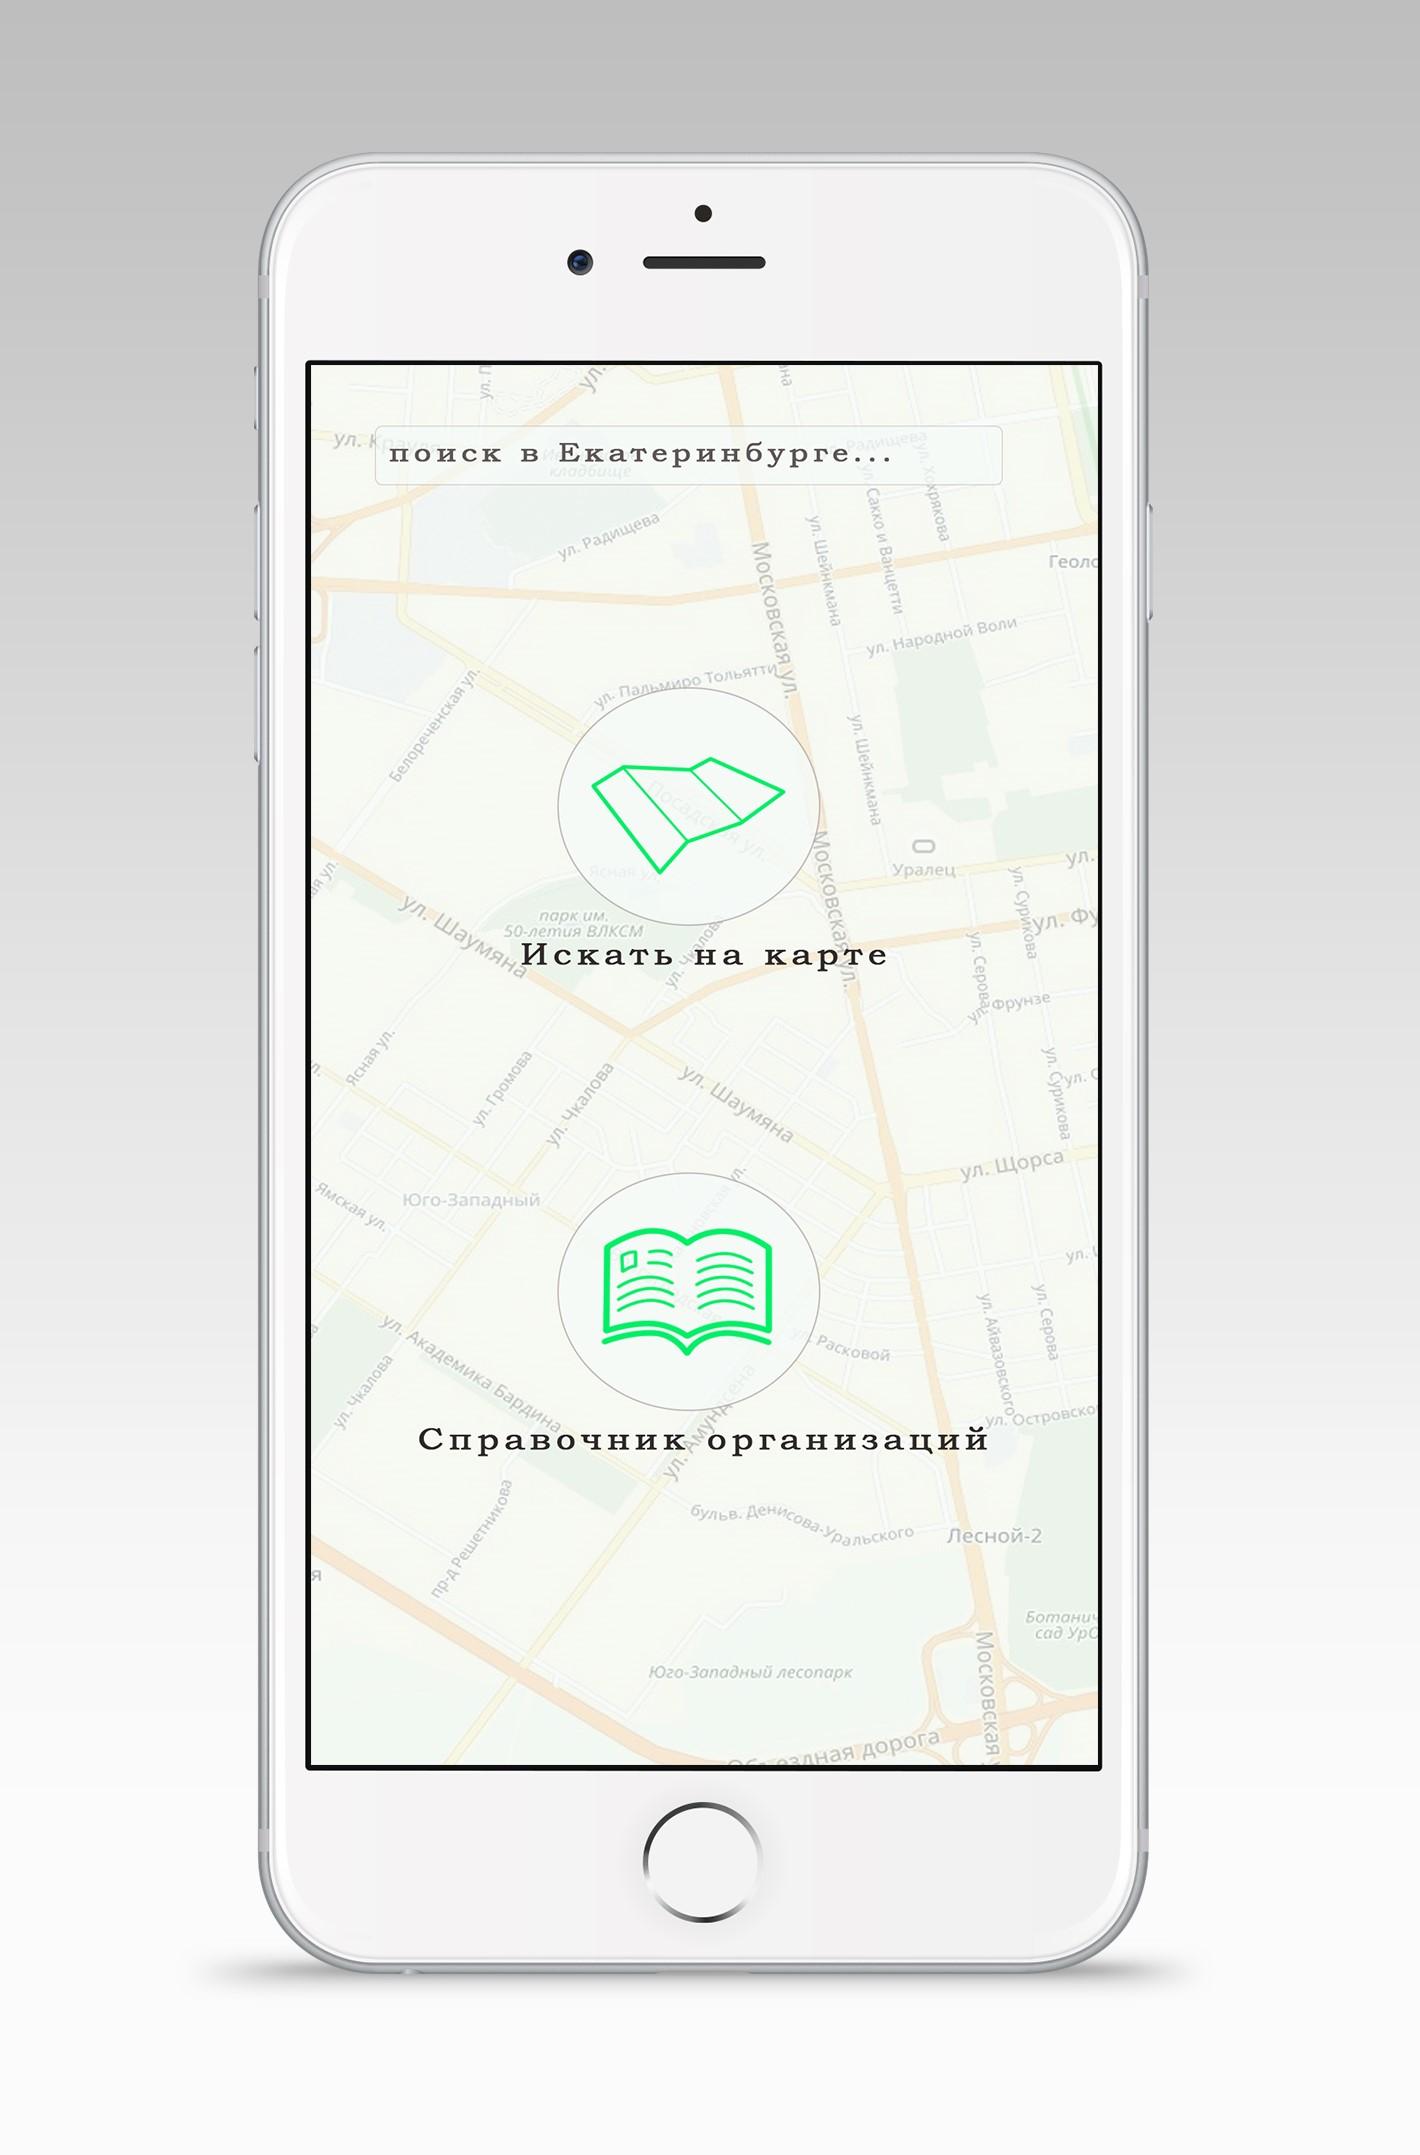 Разработать логотип и экран загрузки приложения фото f_2255a8d5e6d53555.jpg